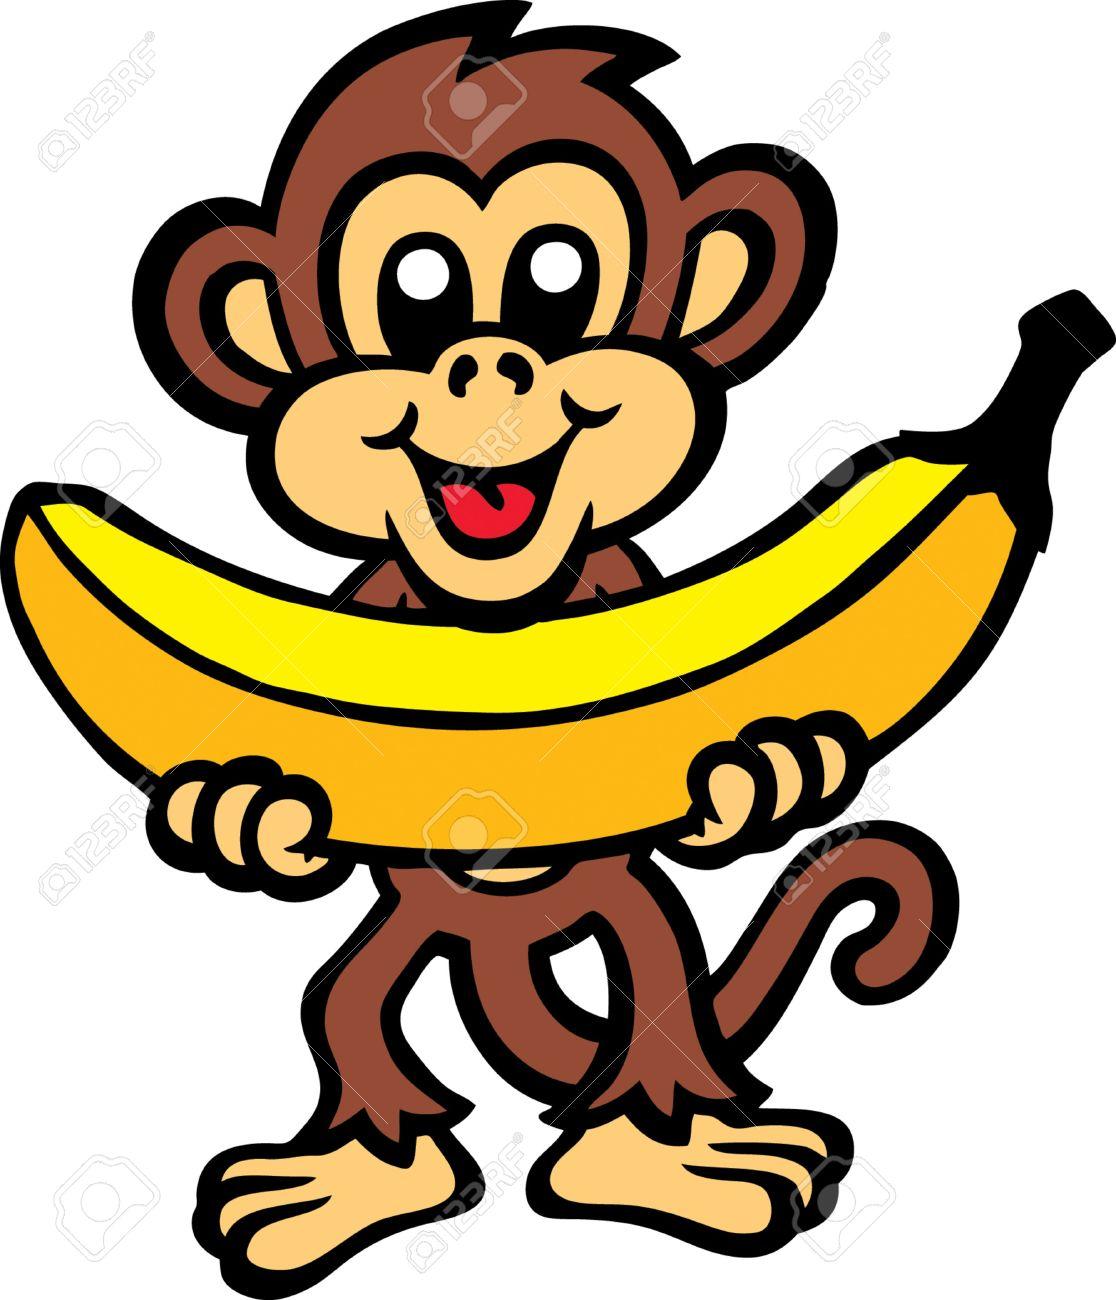 monkey banana rh 123rf com  free clipart monkey eating banana